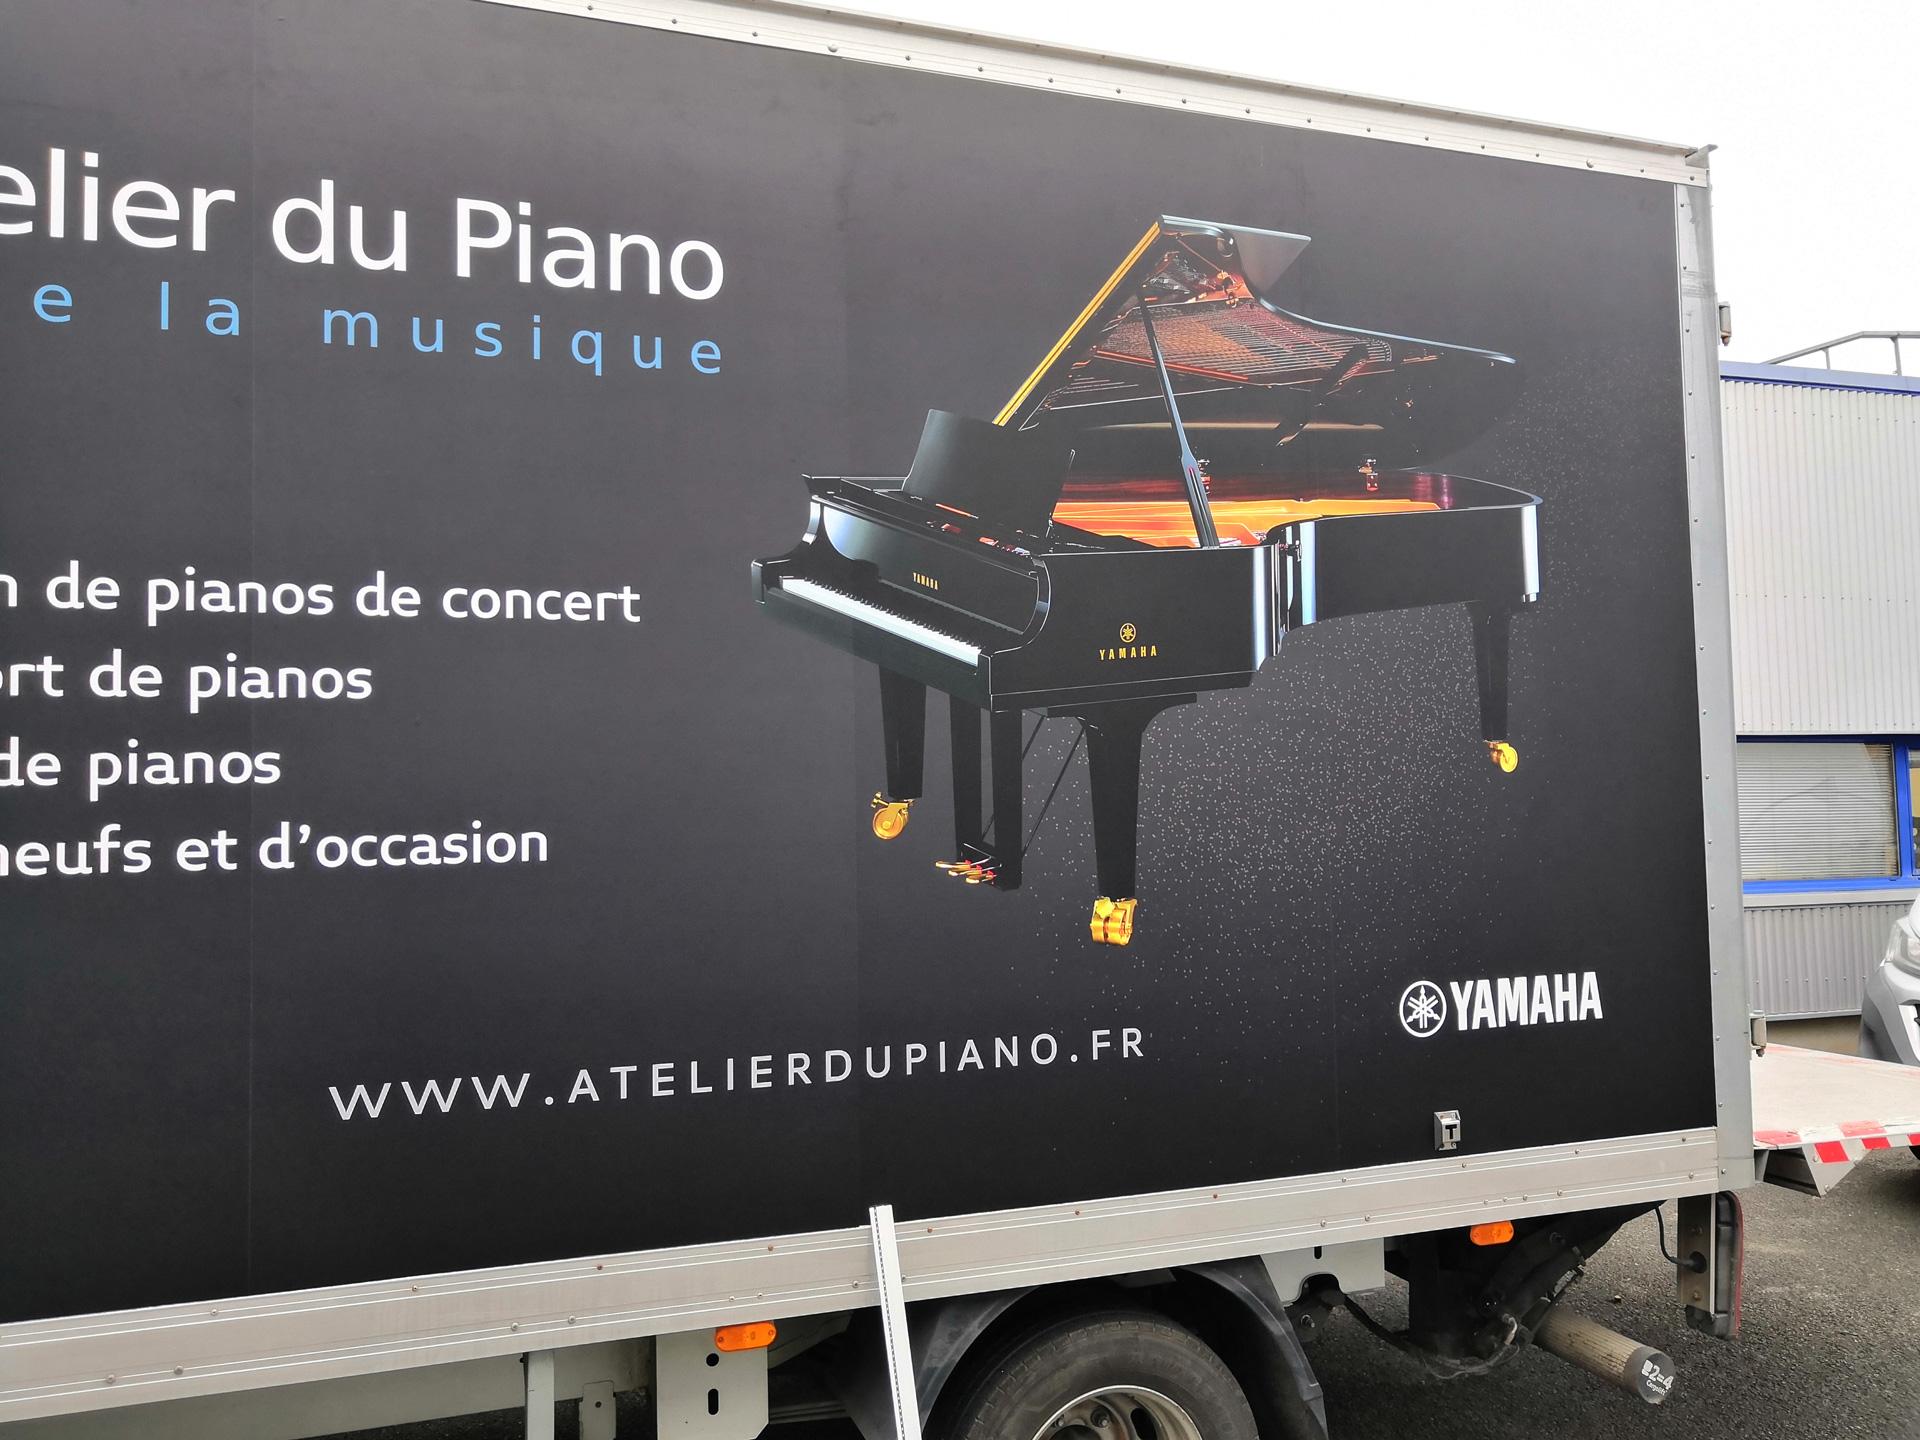 Latelier-du-piano-marquage-vehicule-Coqueliko-2